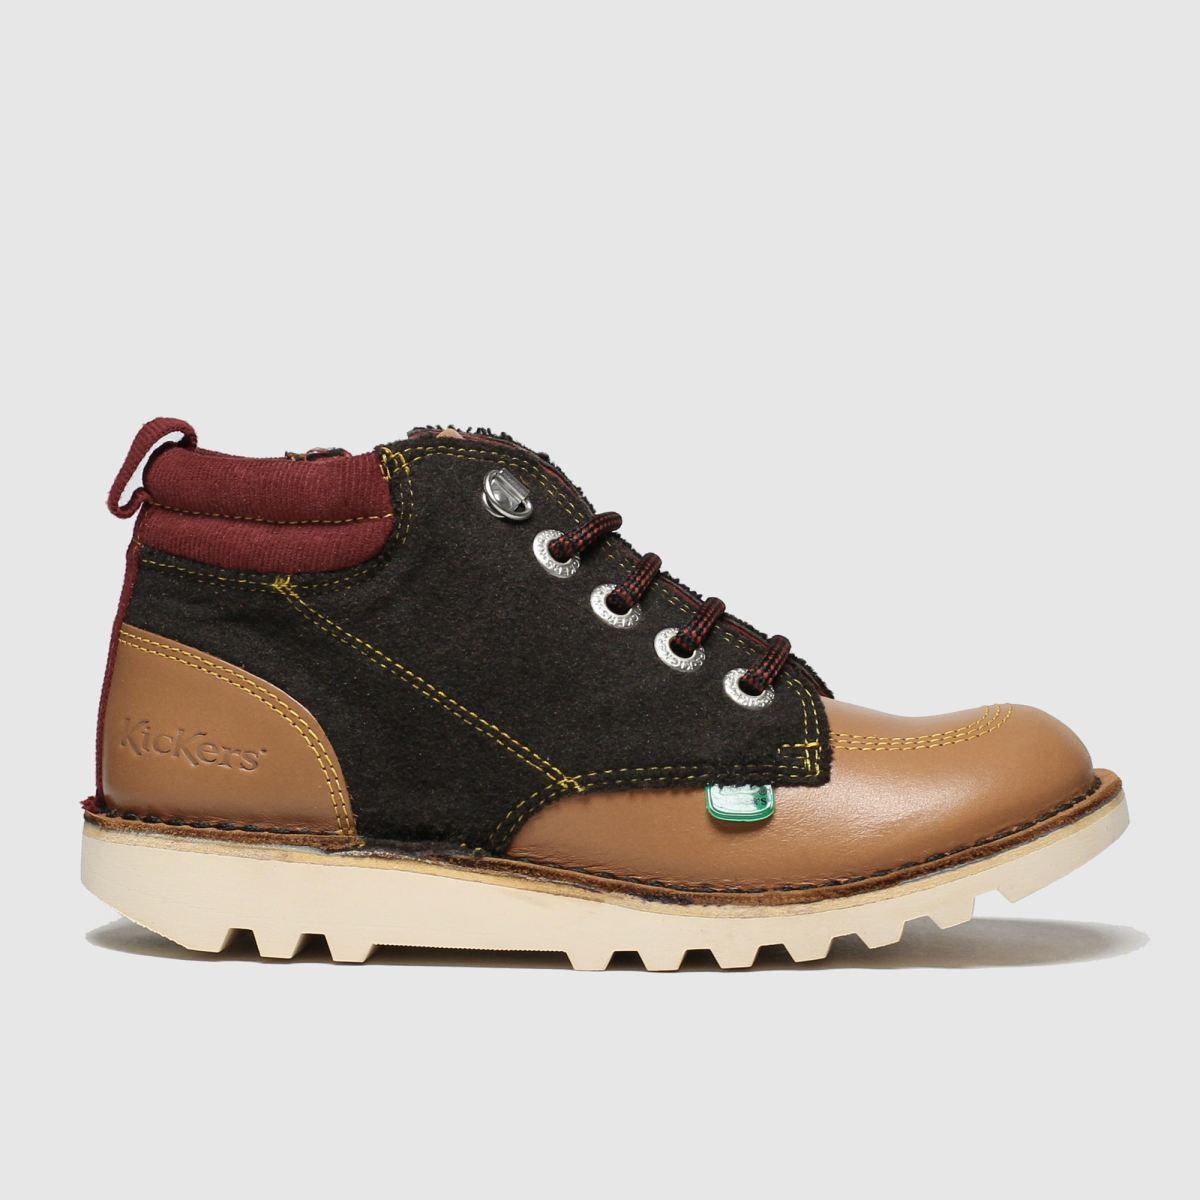 Kickers Brown & Red Kick Hi Winterised Boots Junior